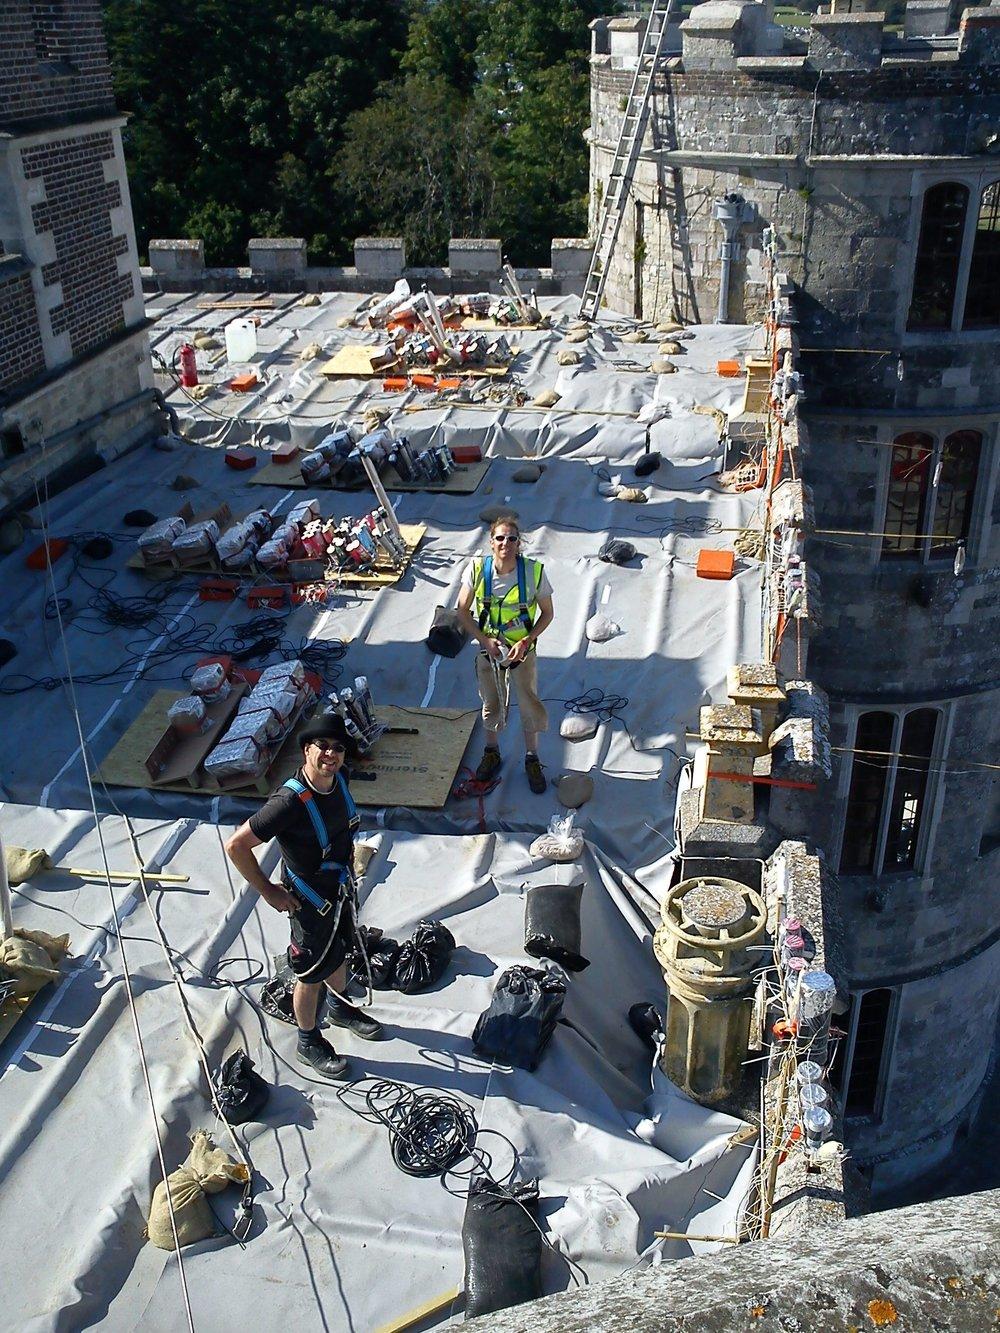 Lulworth Castle Roof July 2012 - Kirk & Hairy -2.JPG